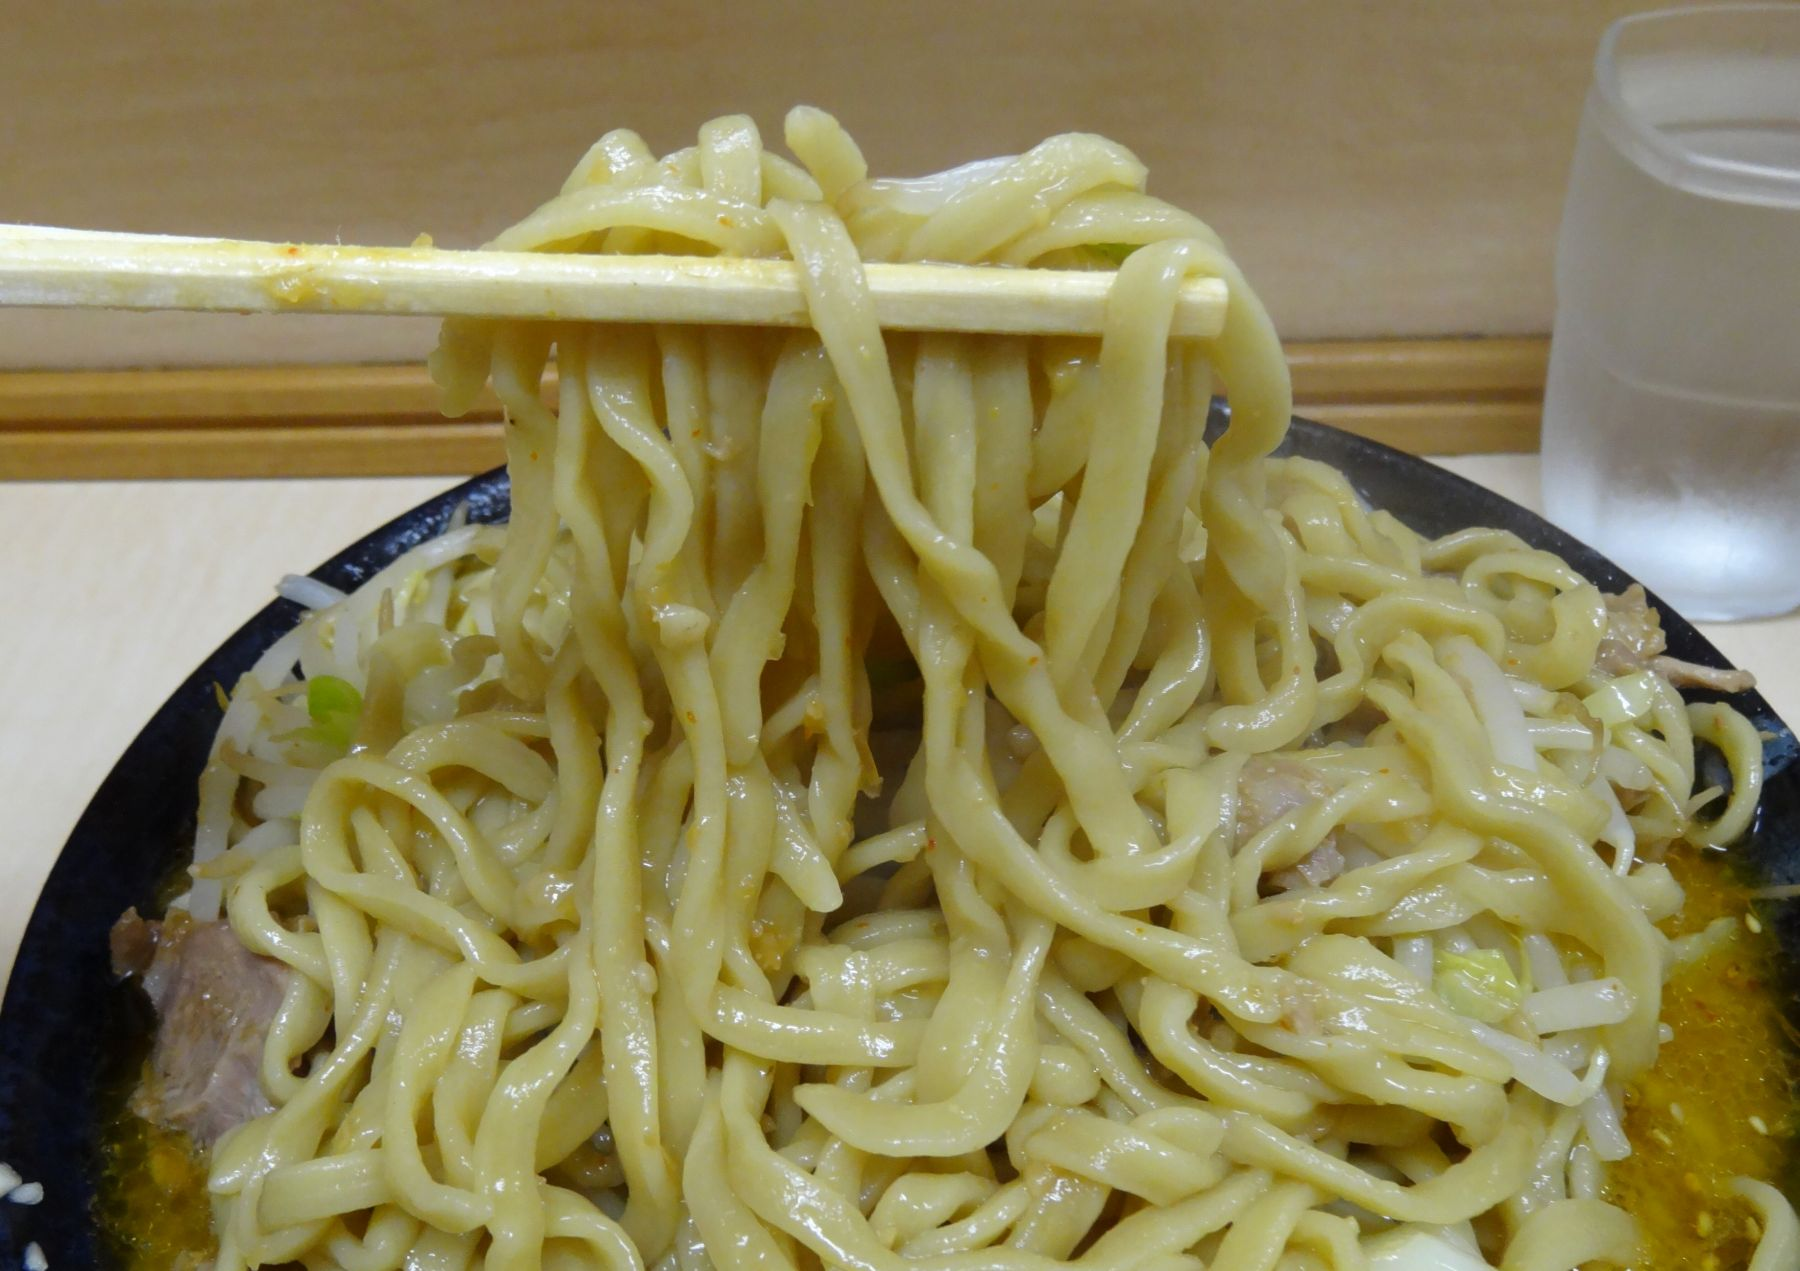 20121107004ookubo.jpg